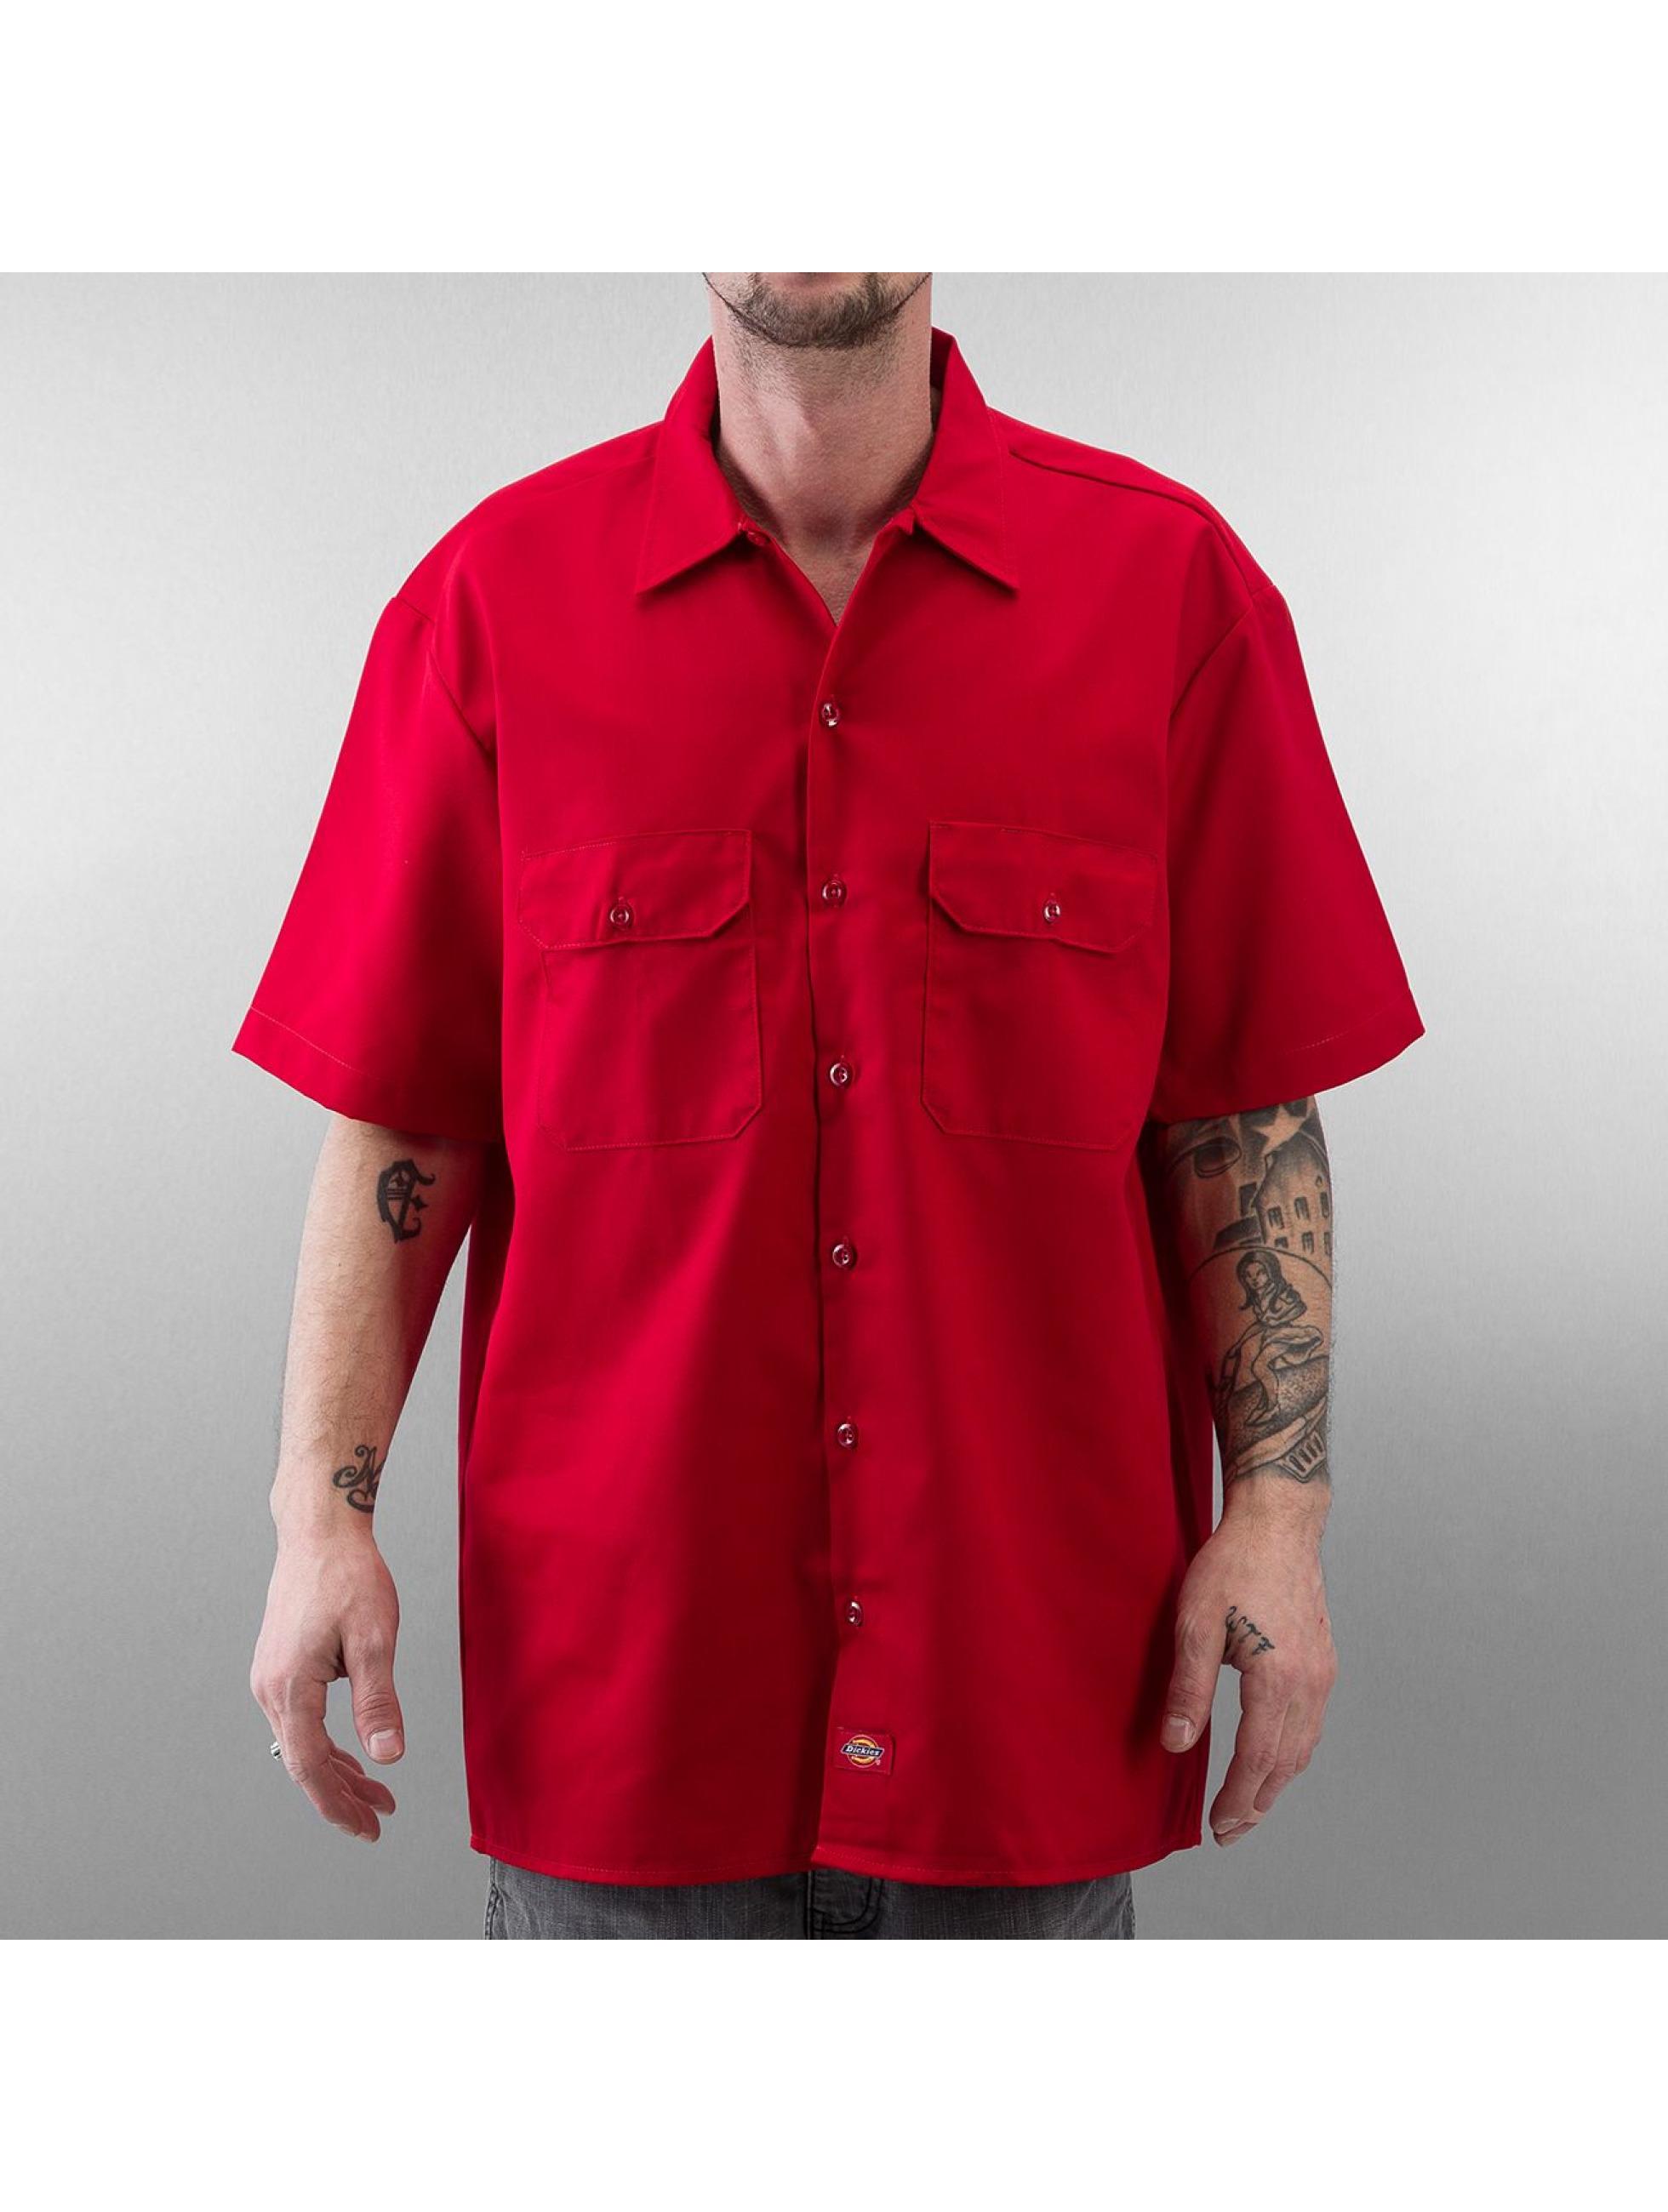 dickies shorts sleeve work rouge homme chemise dickies acheter pas cher haut 122854. Black Bedroom Furniture Sets. Home Design Ideas